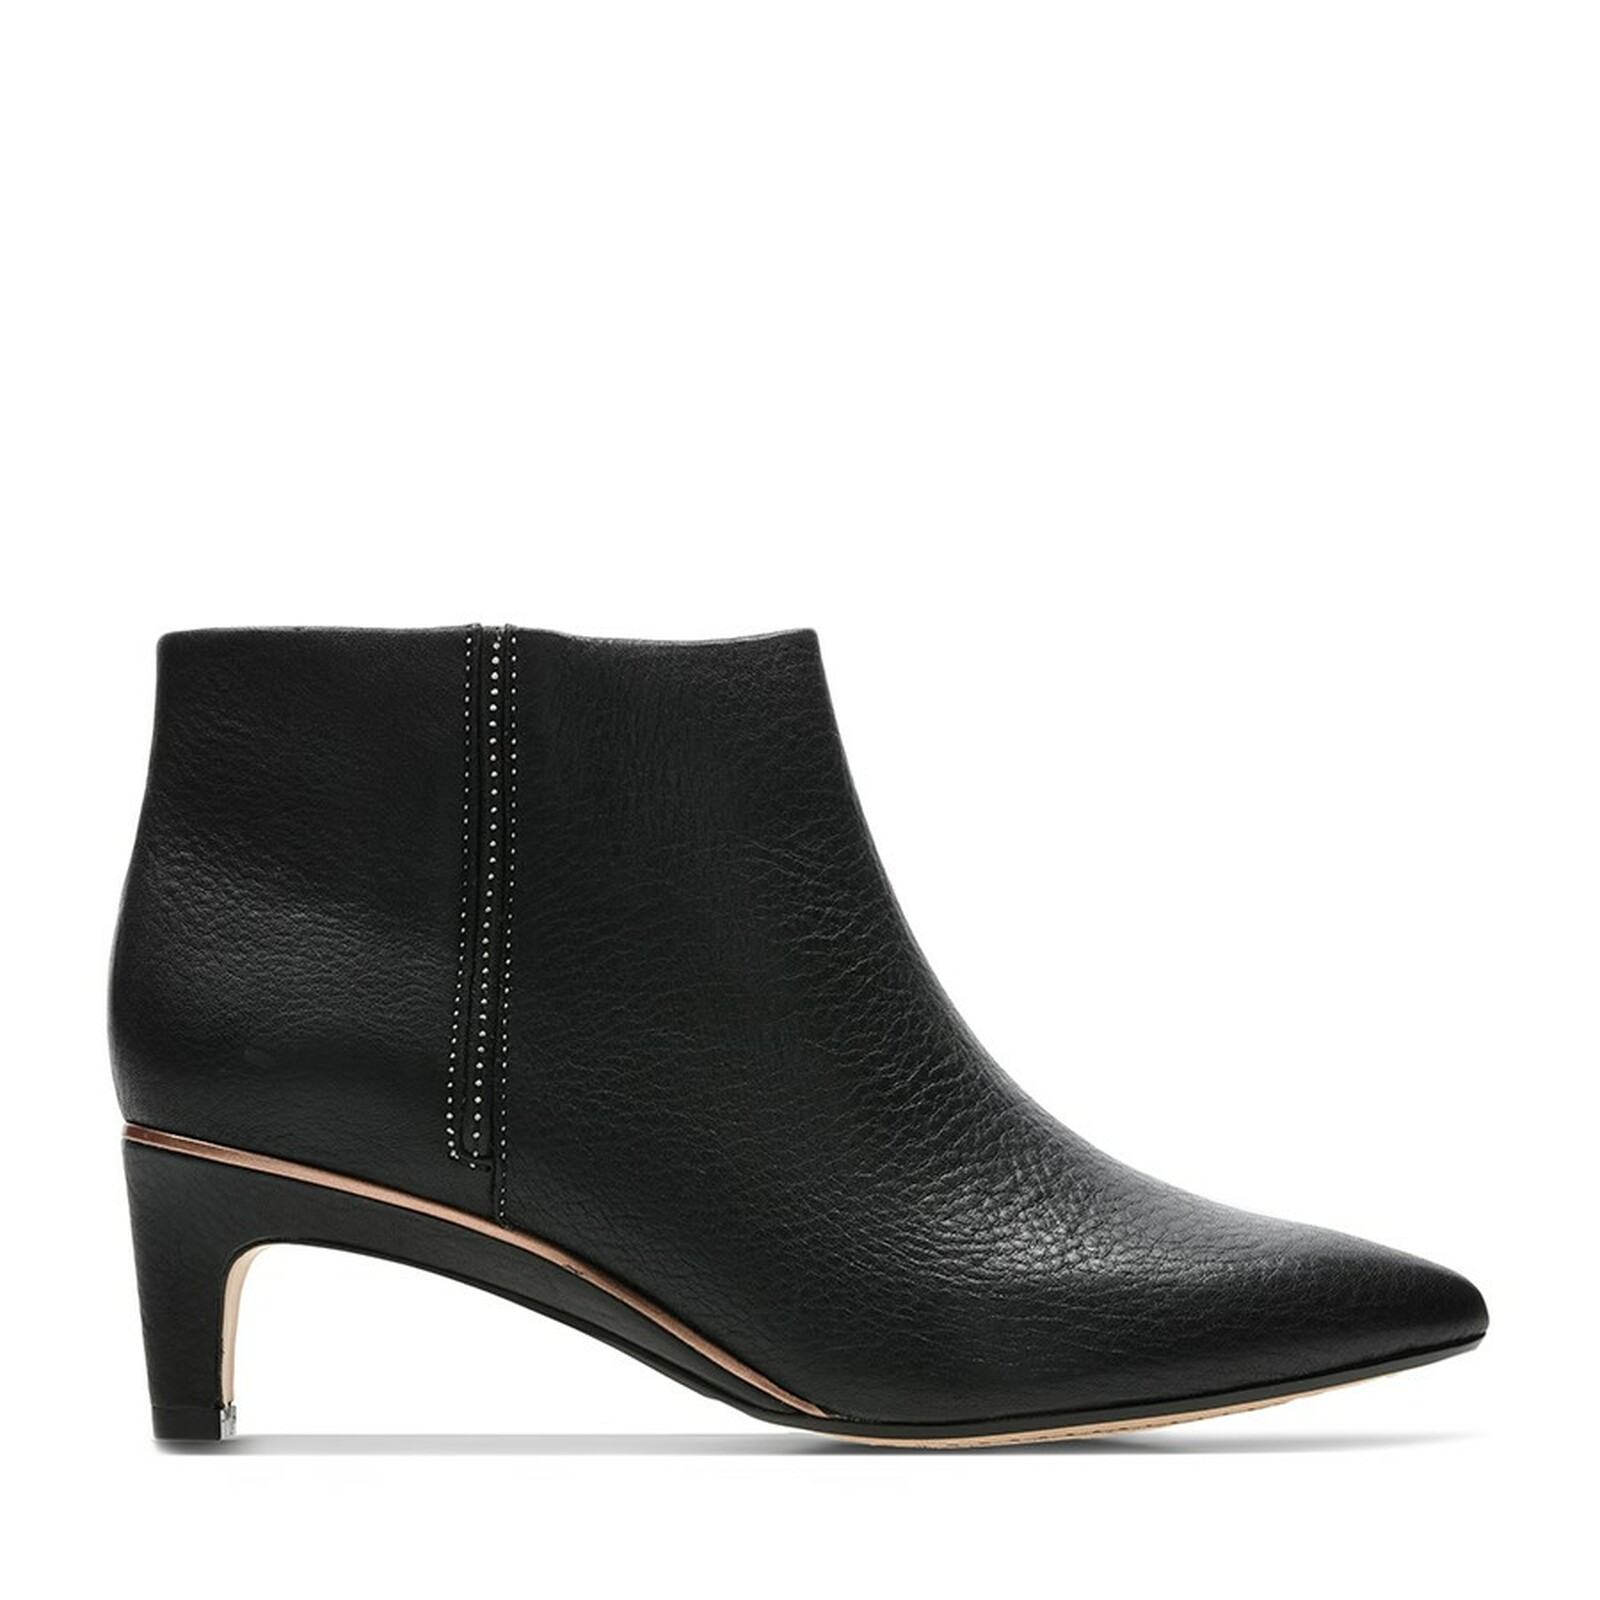 Clarks Womens ELLIS EDEN Black Leather